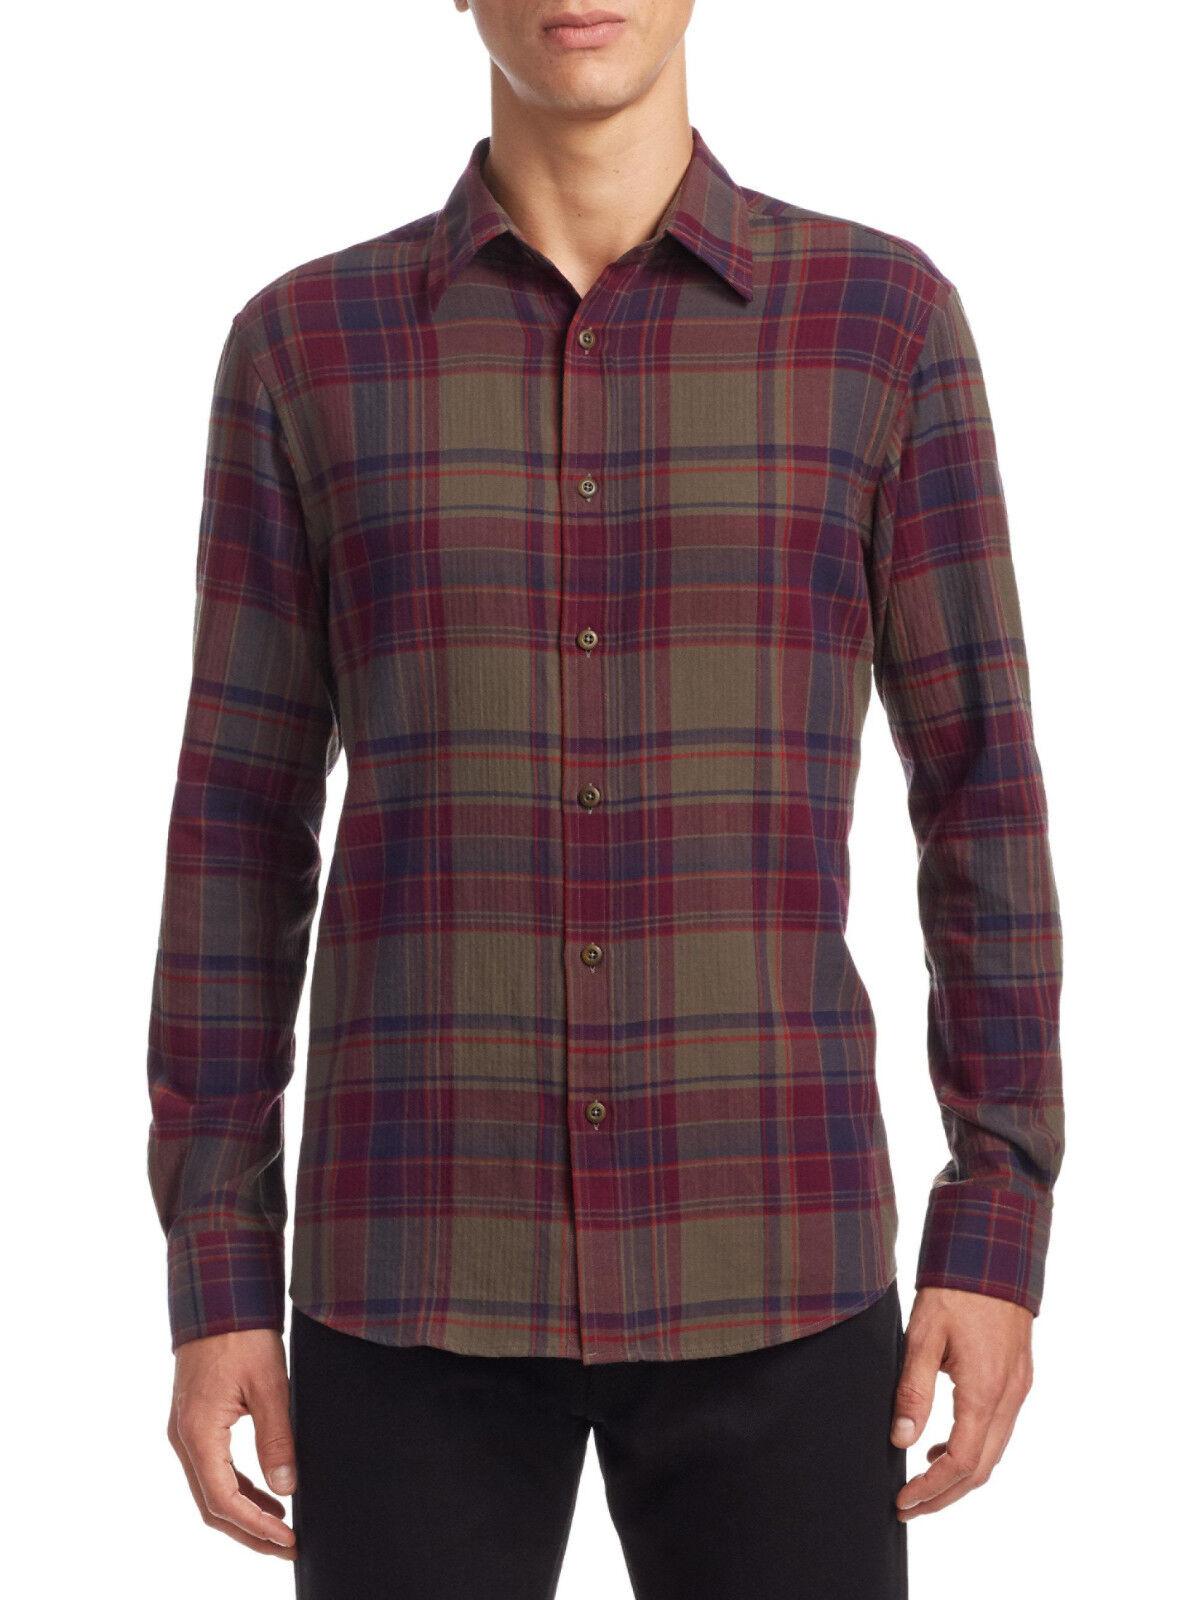 Ralph Lauren Purple Label Plaid Crinkle Stretch Dress Shirt New  595